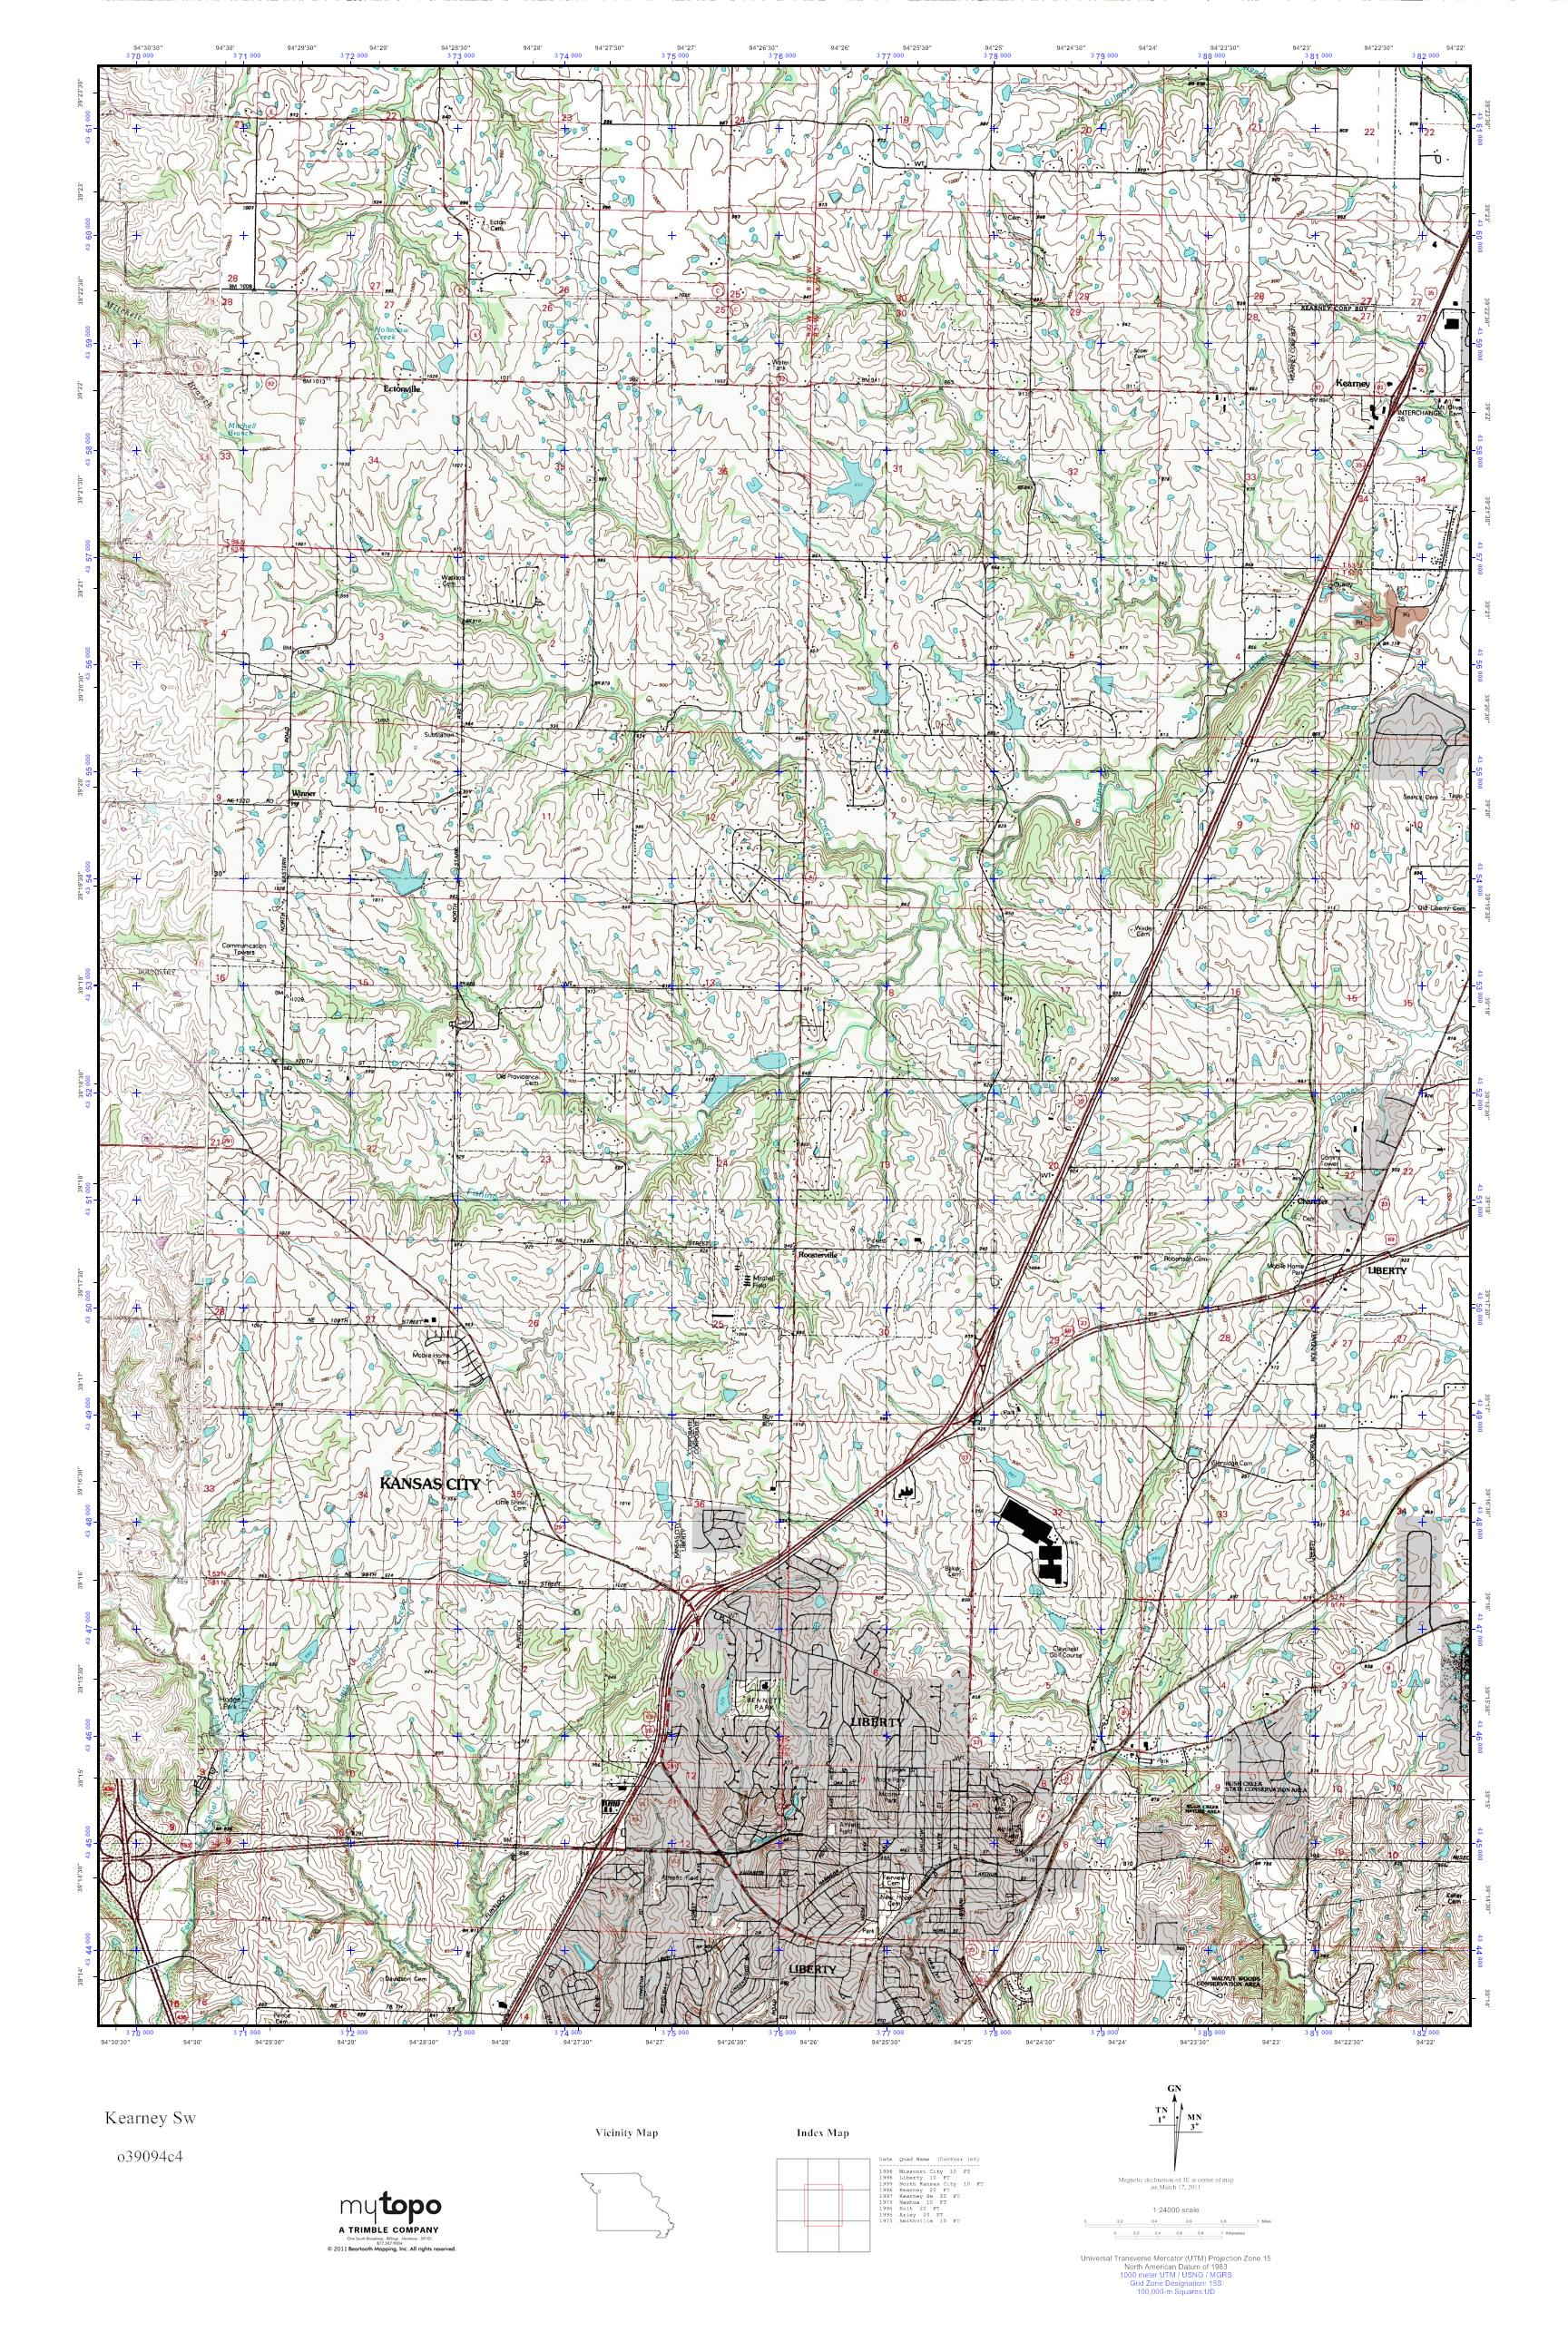 Mytopo Kearney Sw Missouri Usgs Quad Topo Map